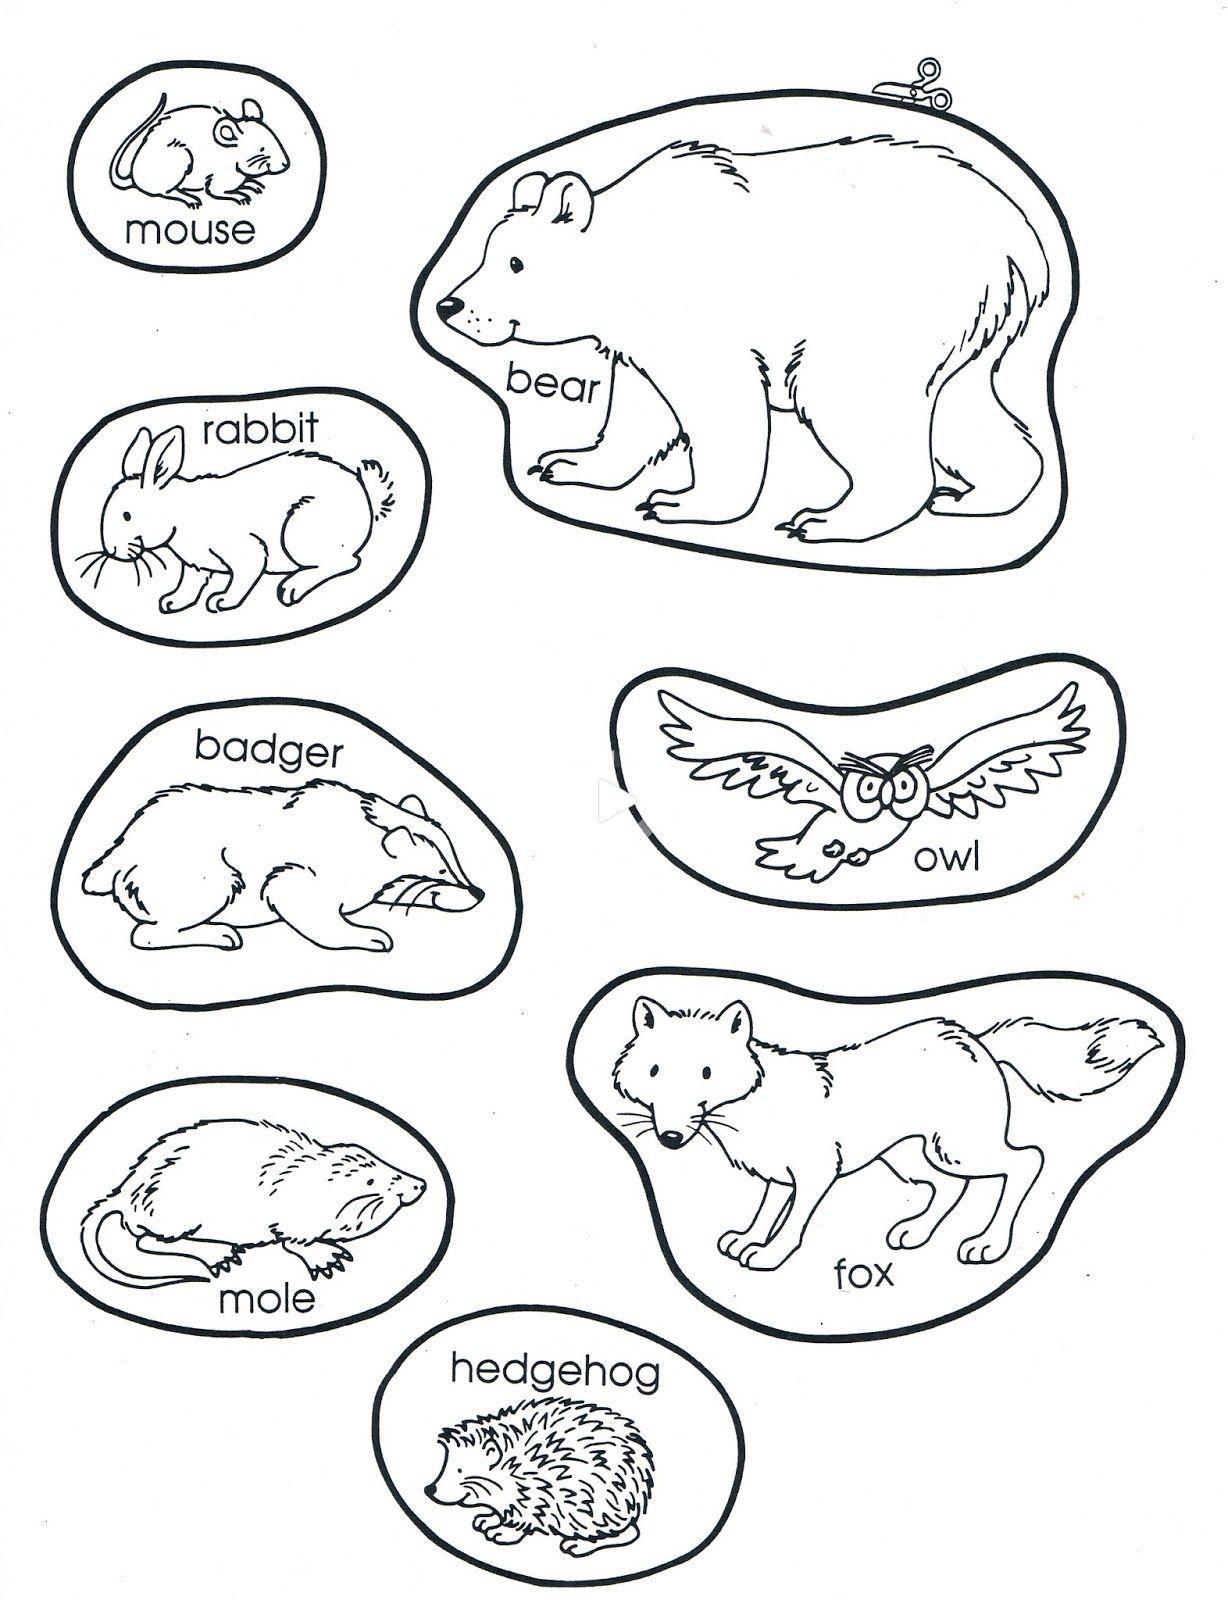 Gel Finish 7 In 1 Nail Enamel In 2021 Preschool Books Animals That Hibernate Winter Kindergarten [ 1600 x 1228 Pixel ]